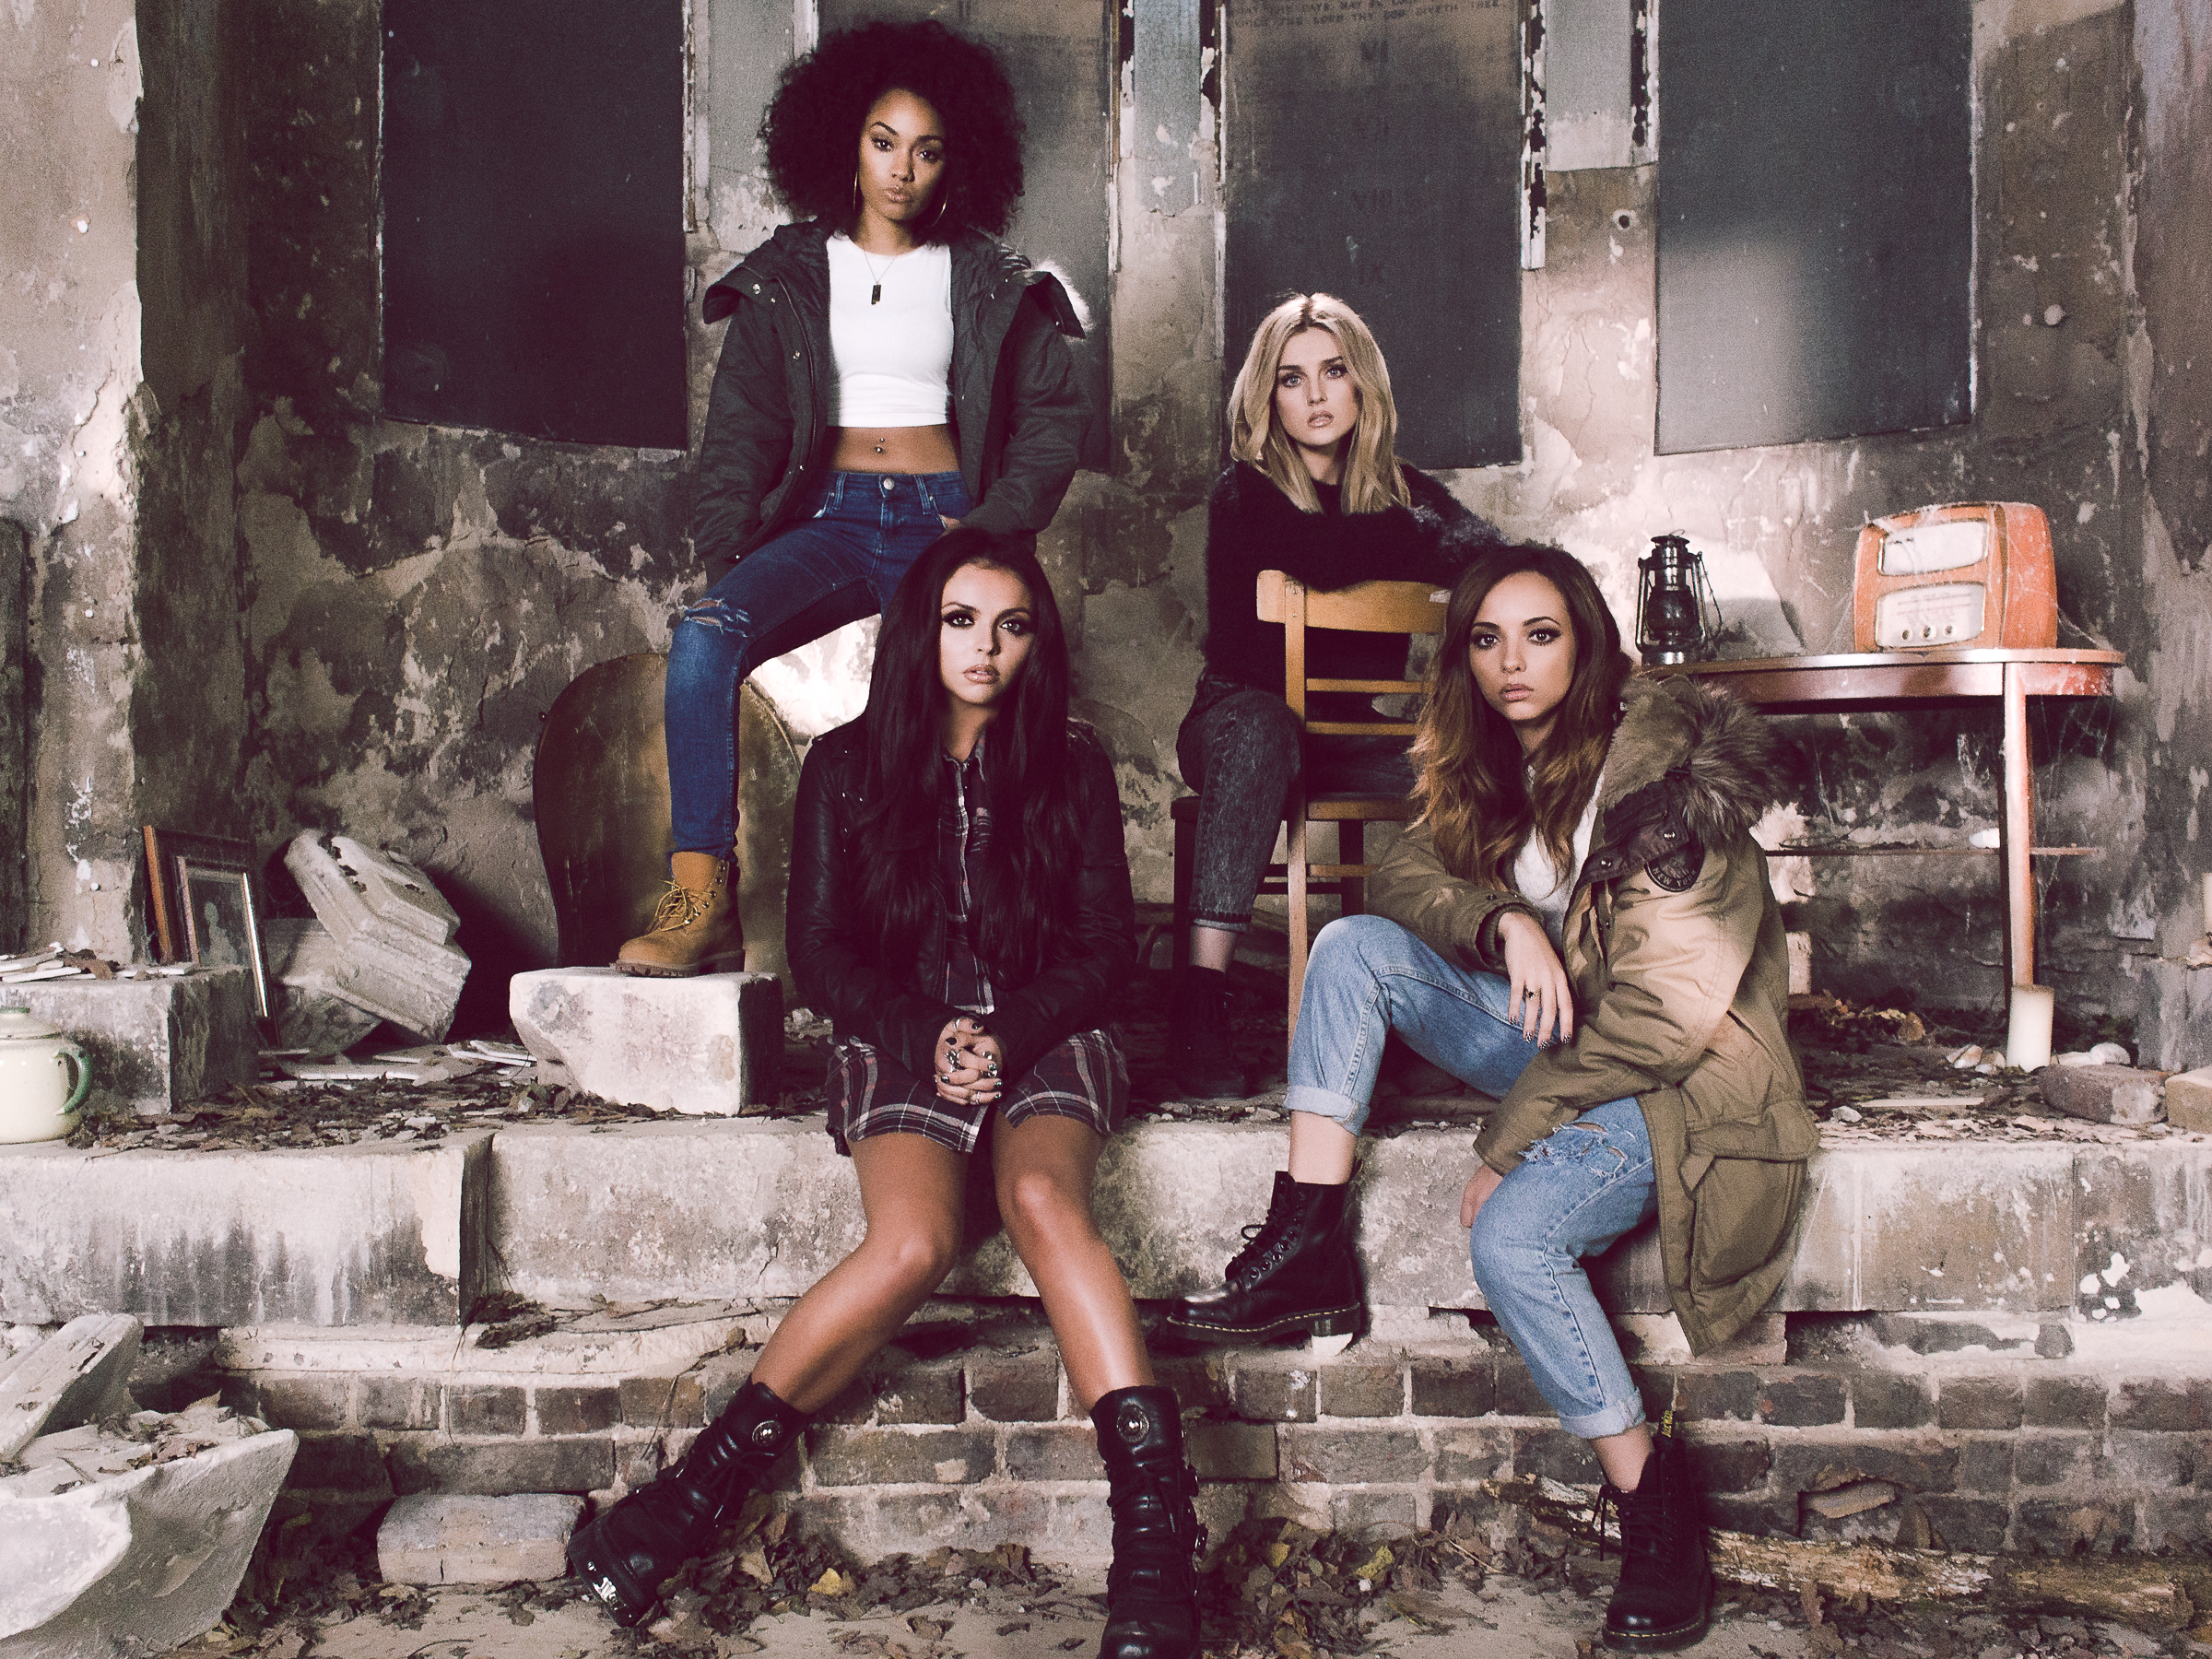 Little Mix Little Me Photoshoot Videoshoot Promo Sony Music SyCo Jay McLaughlin